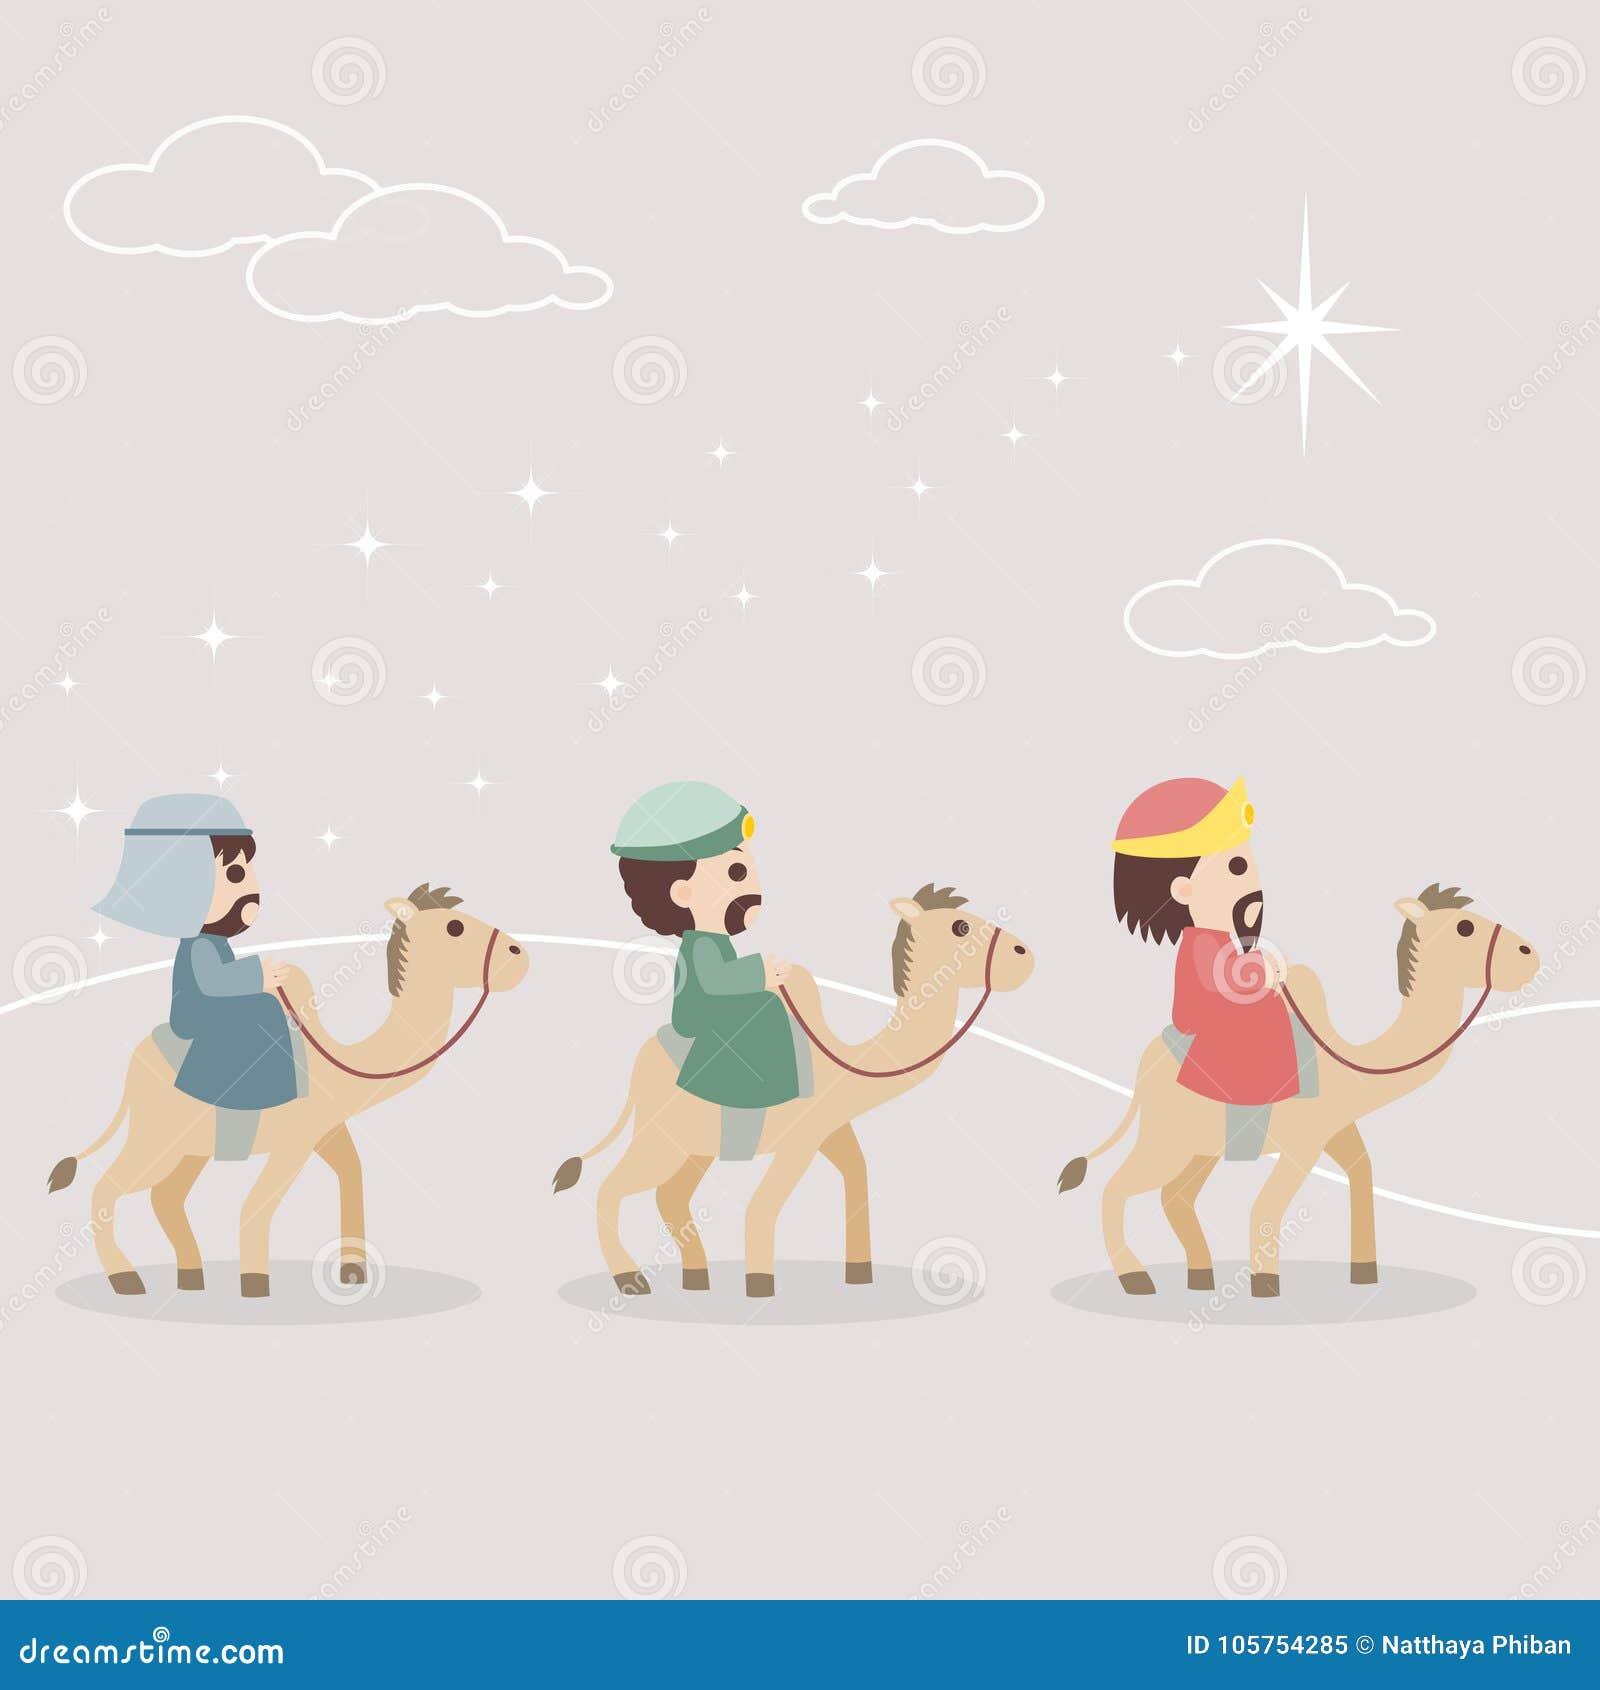 Jesus Story stock vector. Illustration of child, angel - 105754285